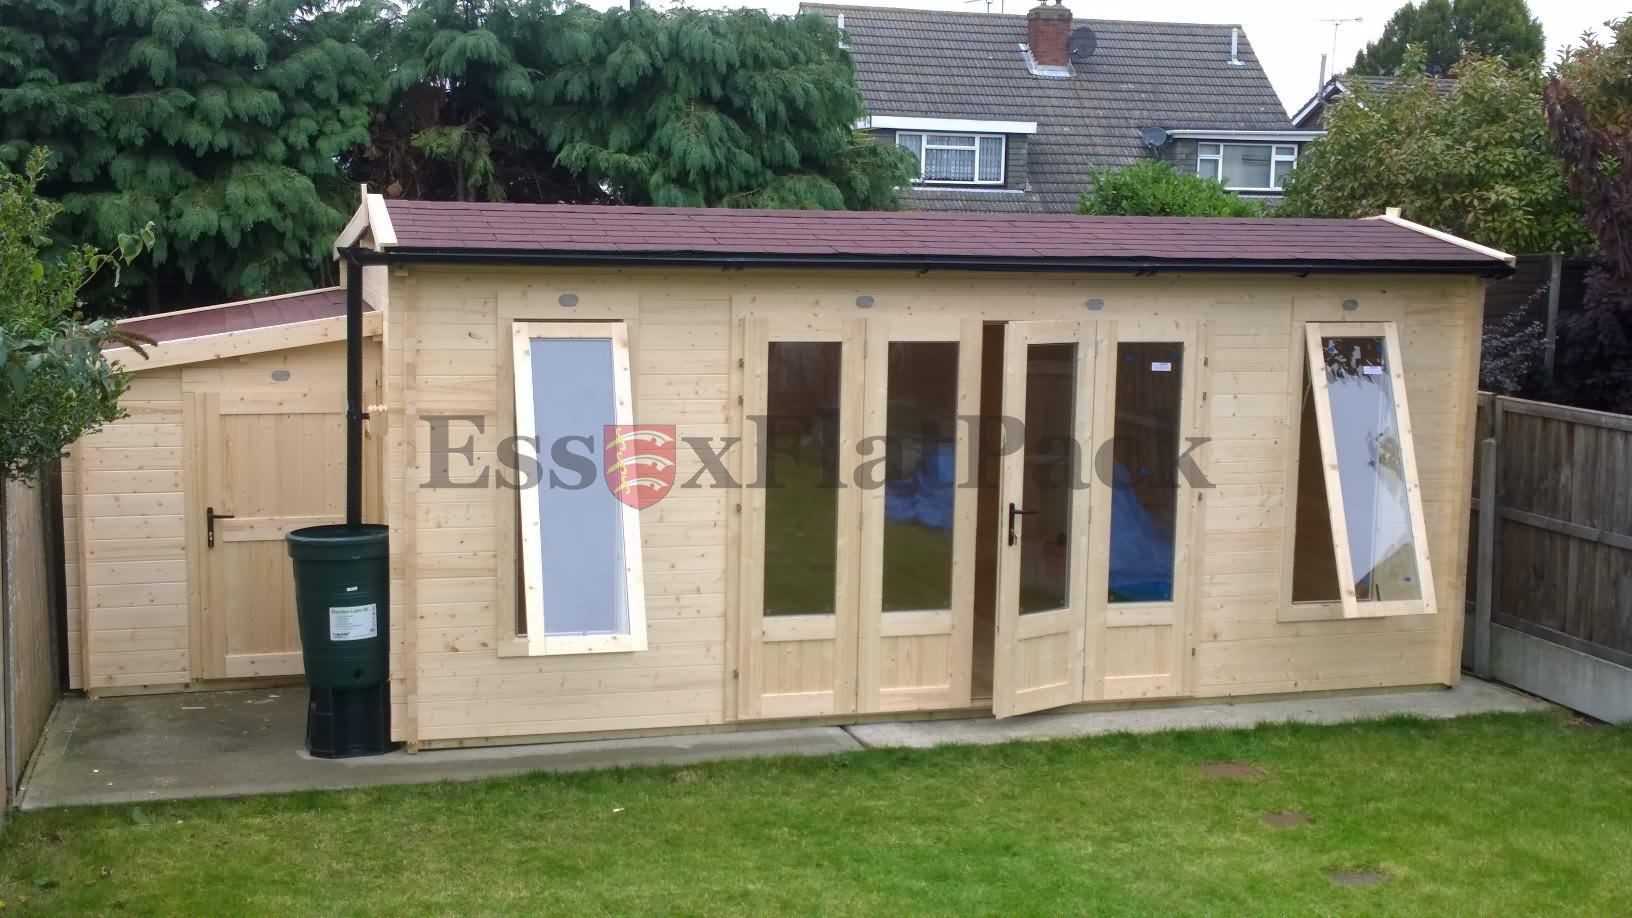 essexflatpack-log-cabins-20151005155051.jpg